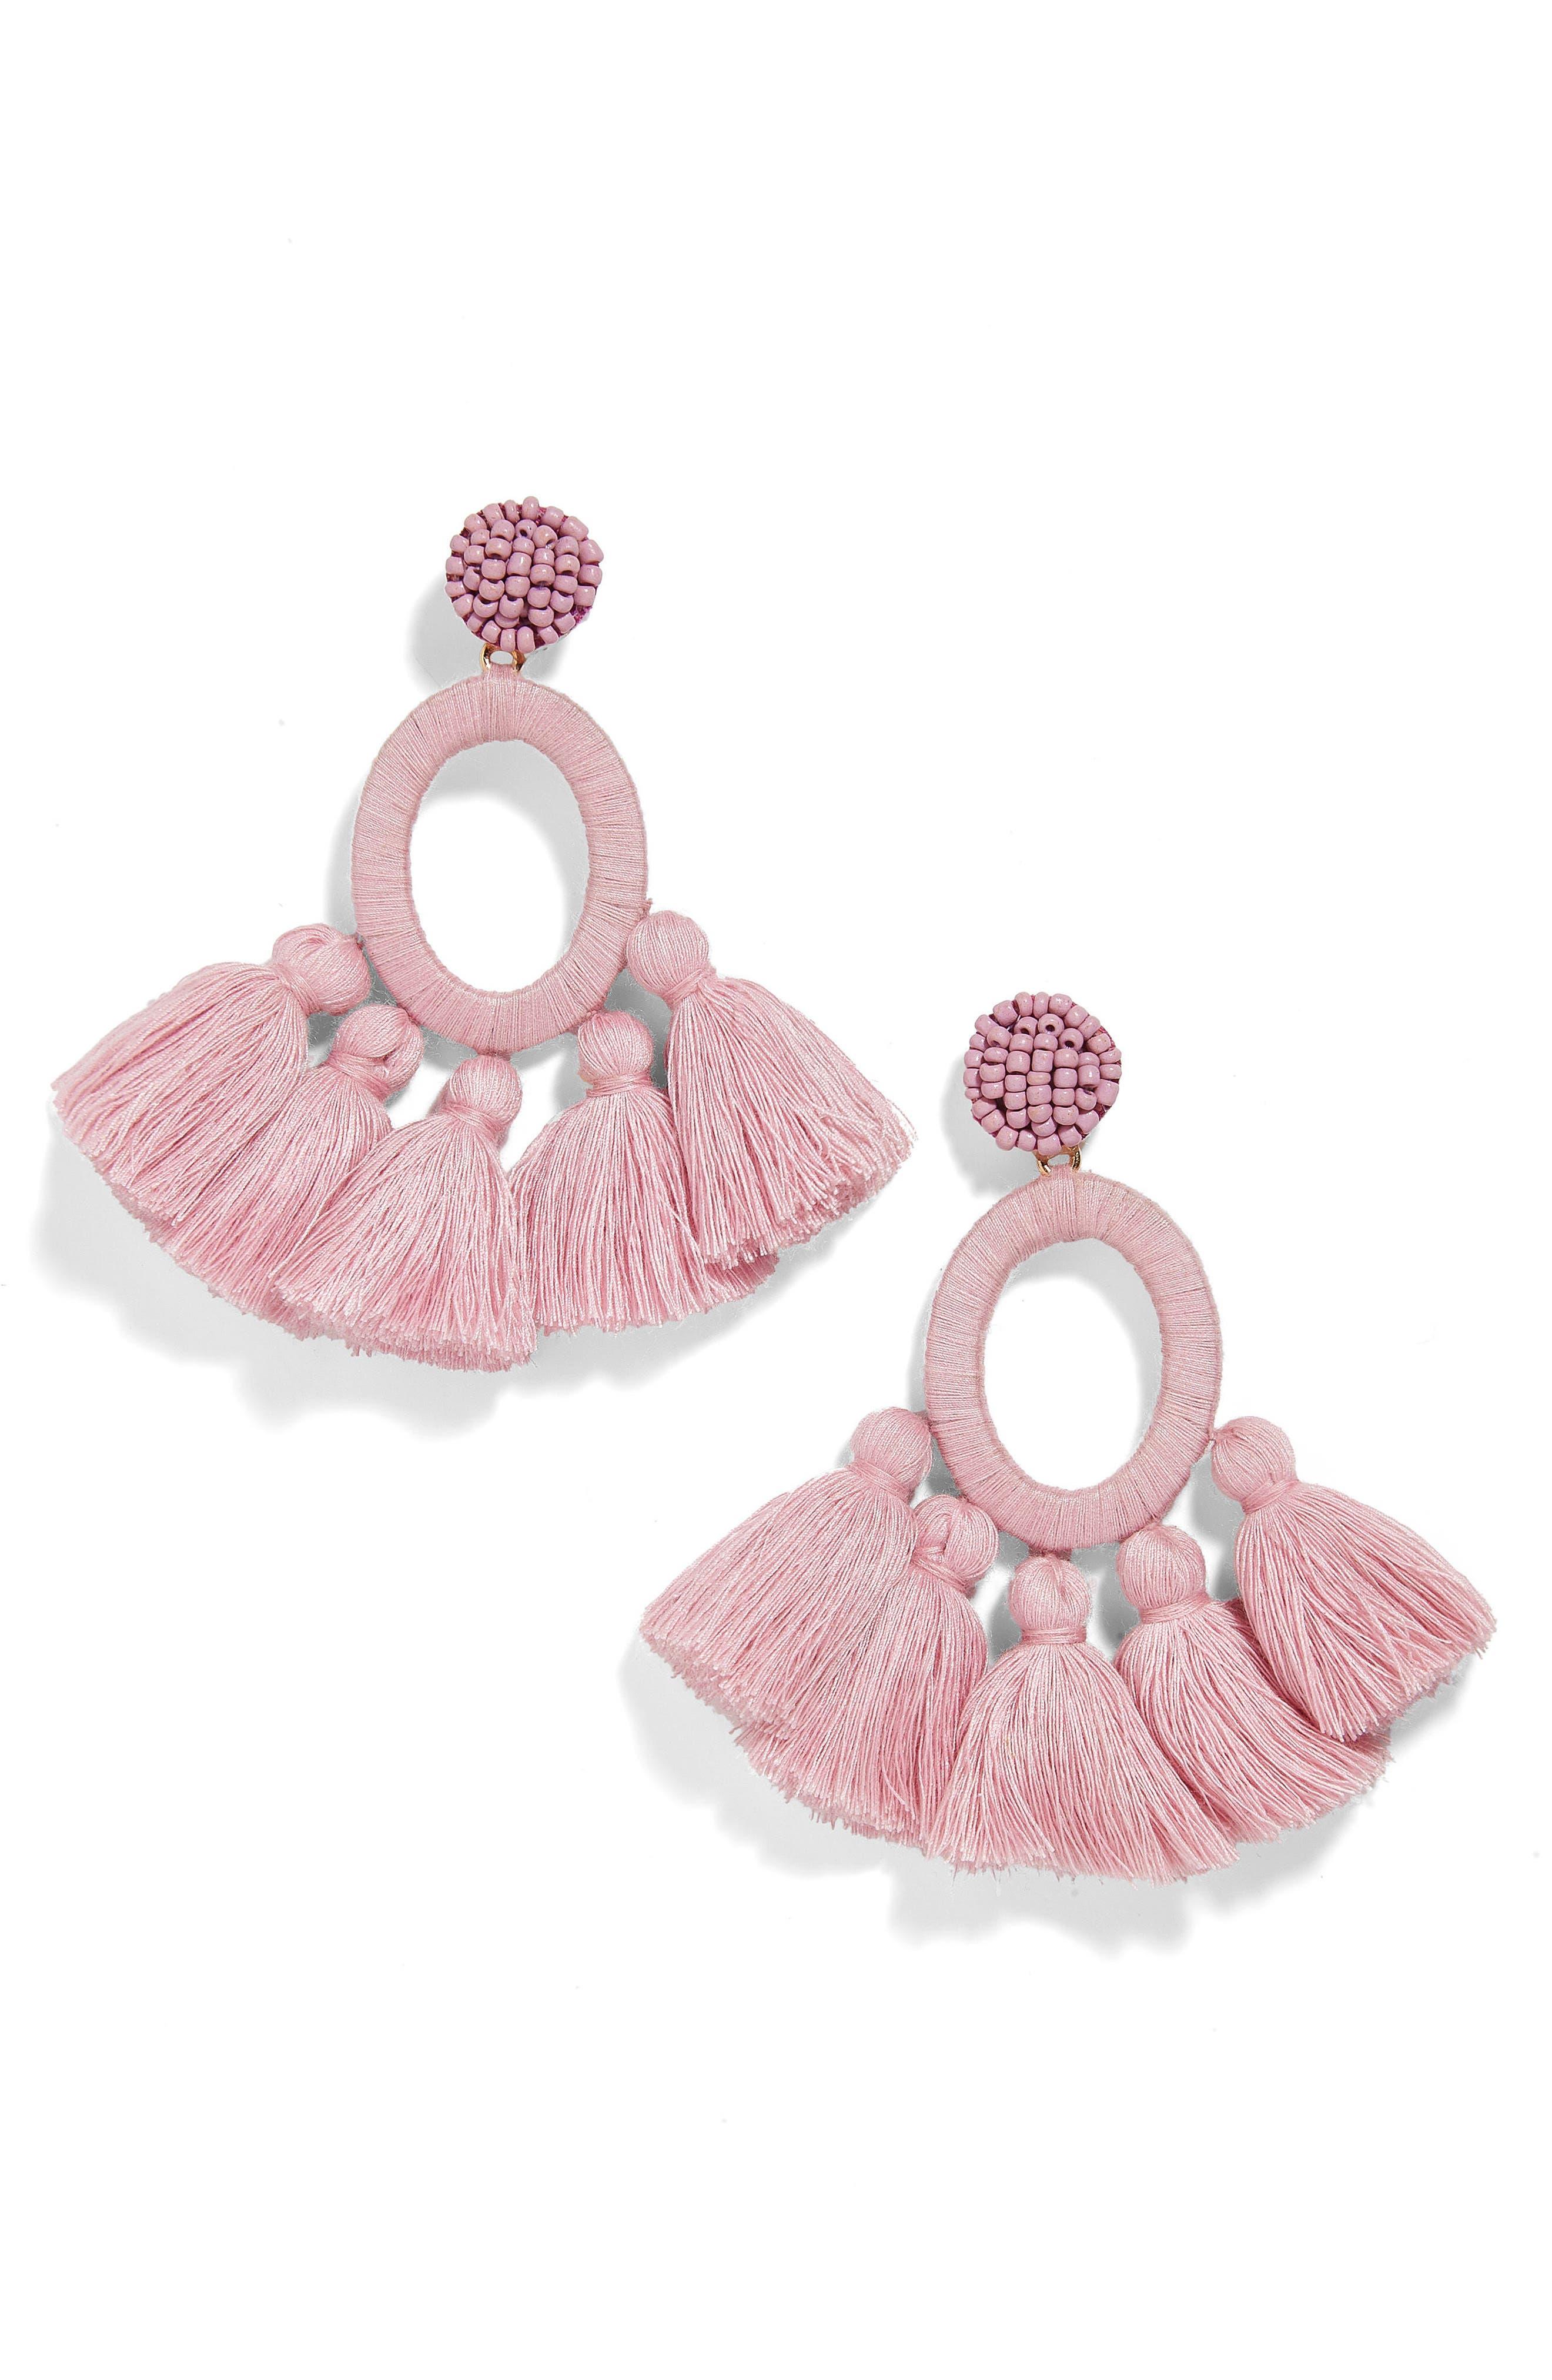 Abacos Tassel Earrings,                         Main,                         color, BLUSH